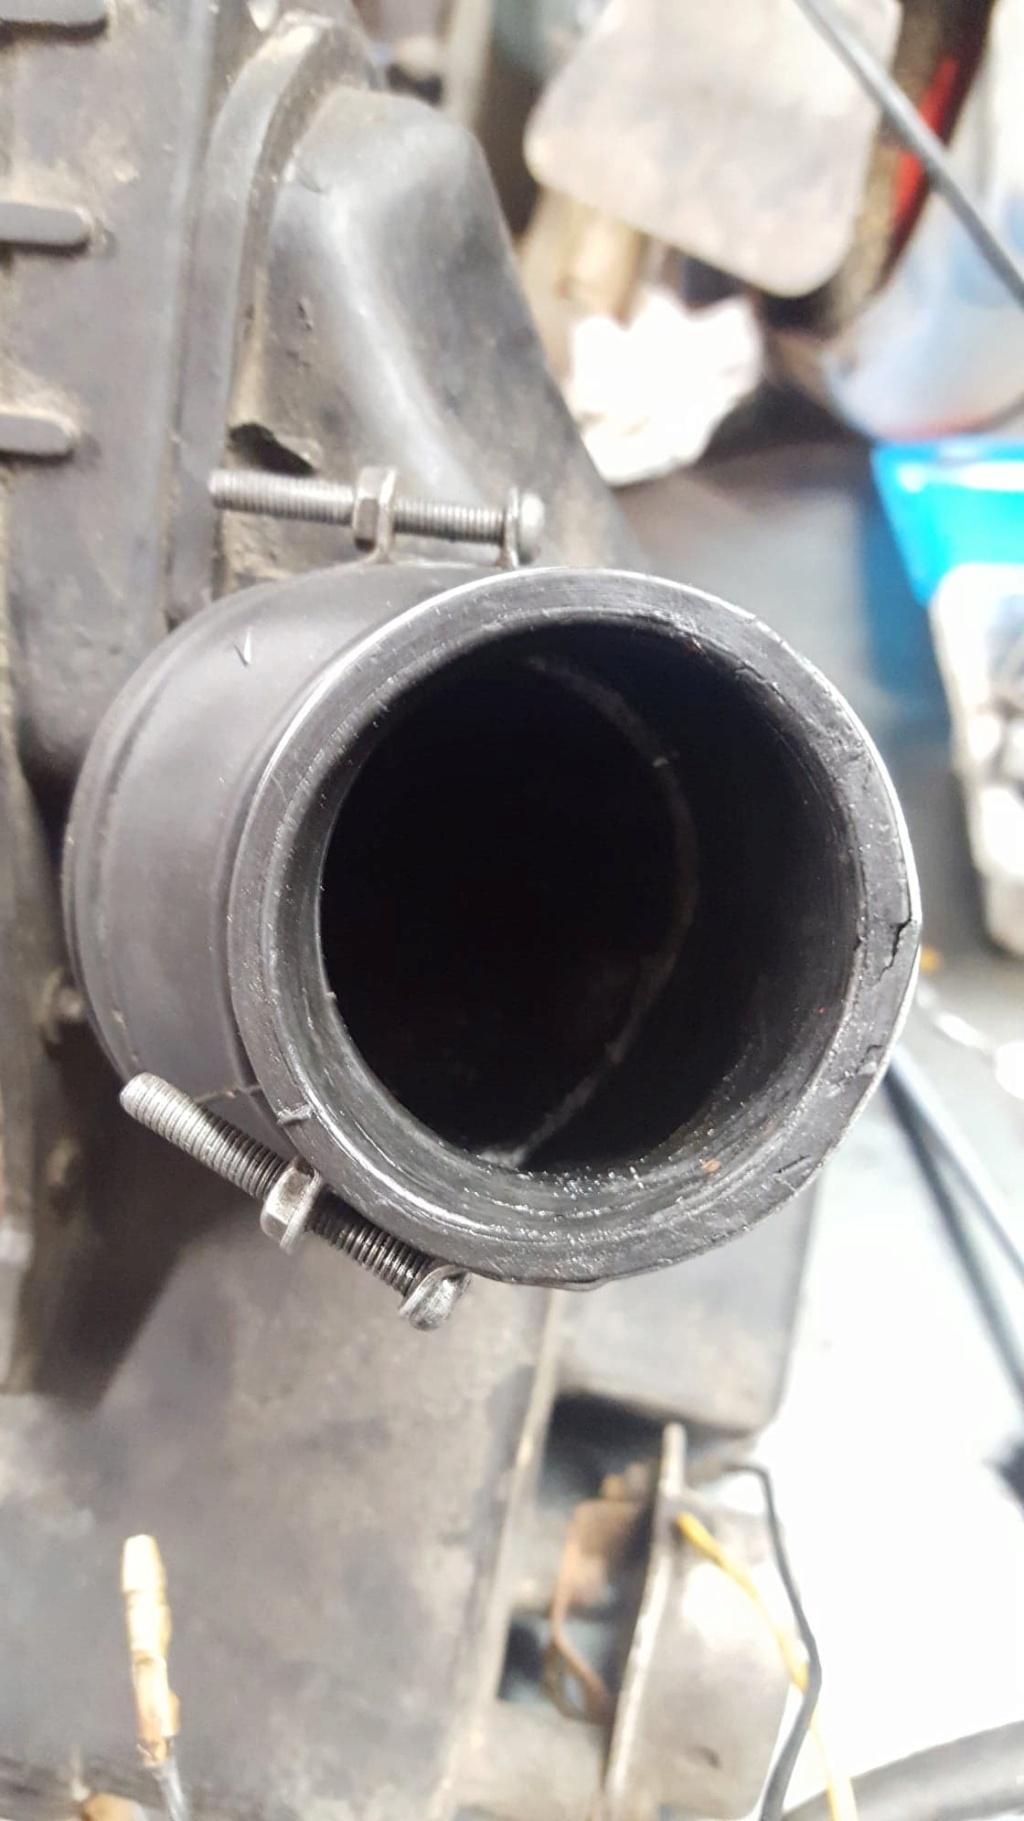 Adaptation cylindre Chinois 175 (18L) sur bas moteur 125 2A8 - Page 3 15848410